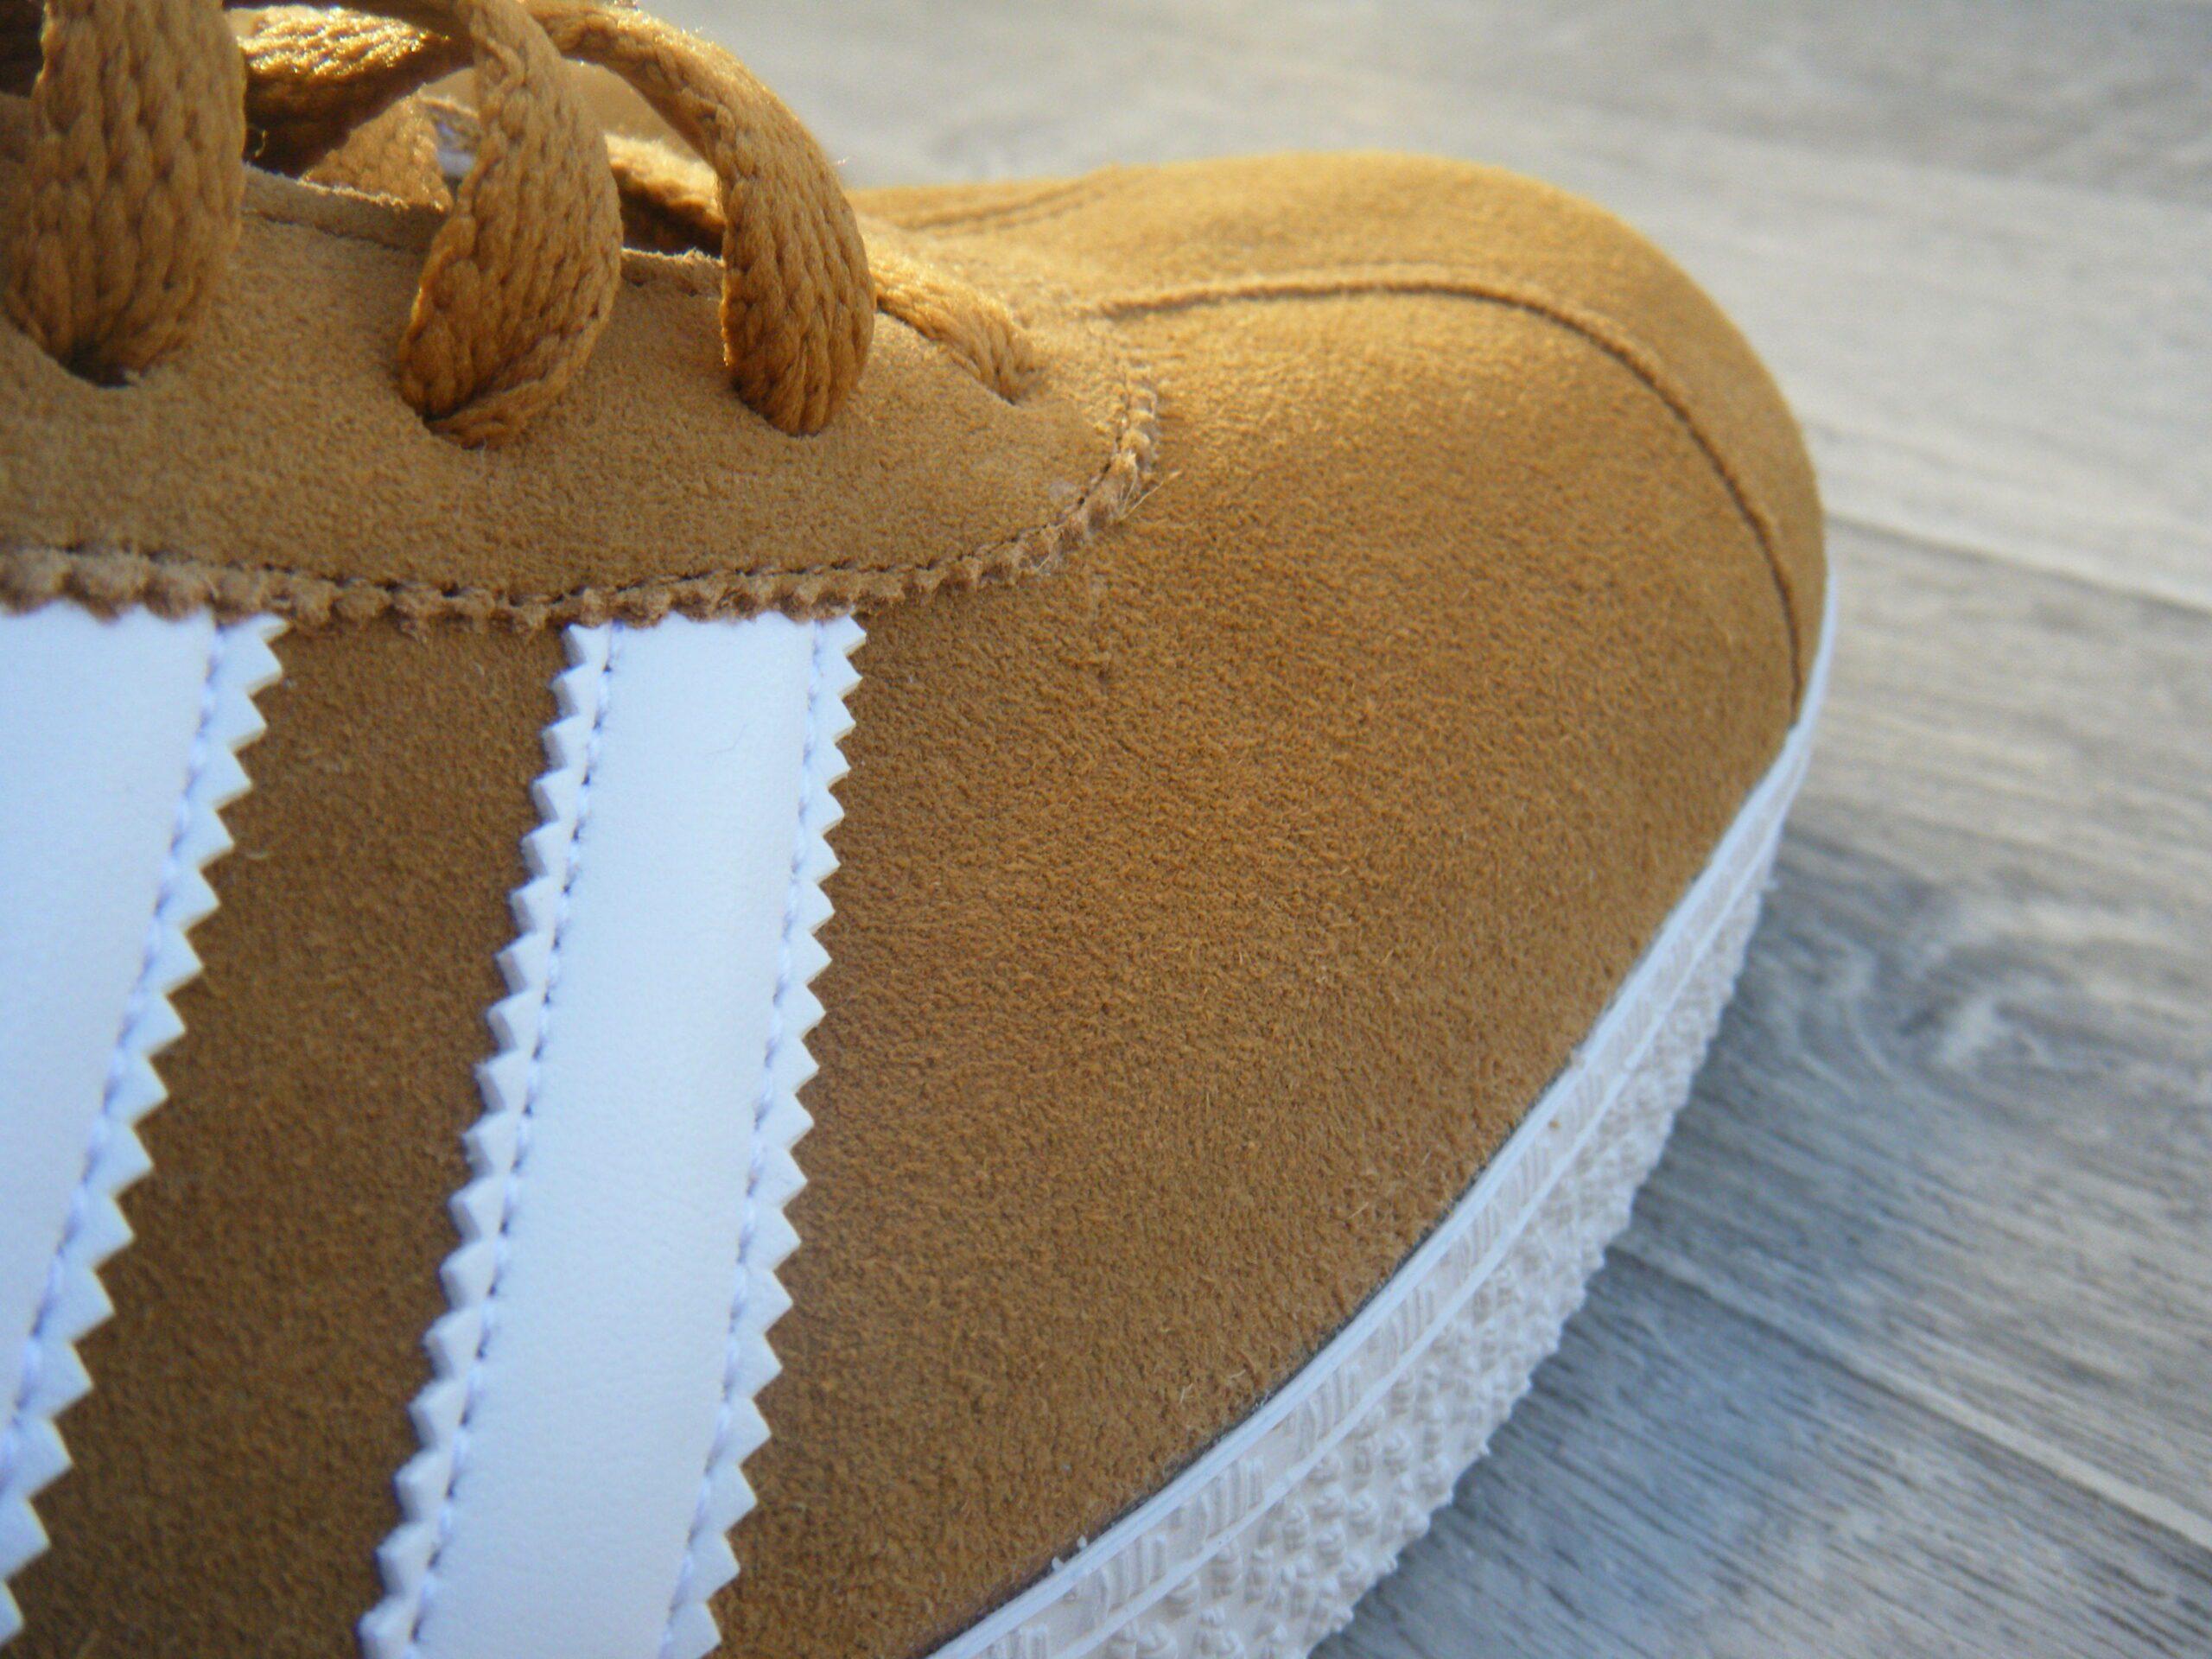 gazelle adidas camel |